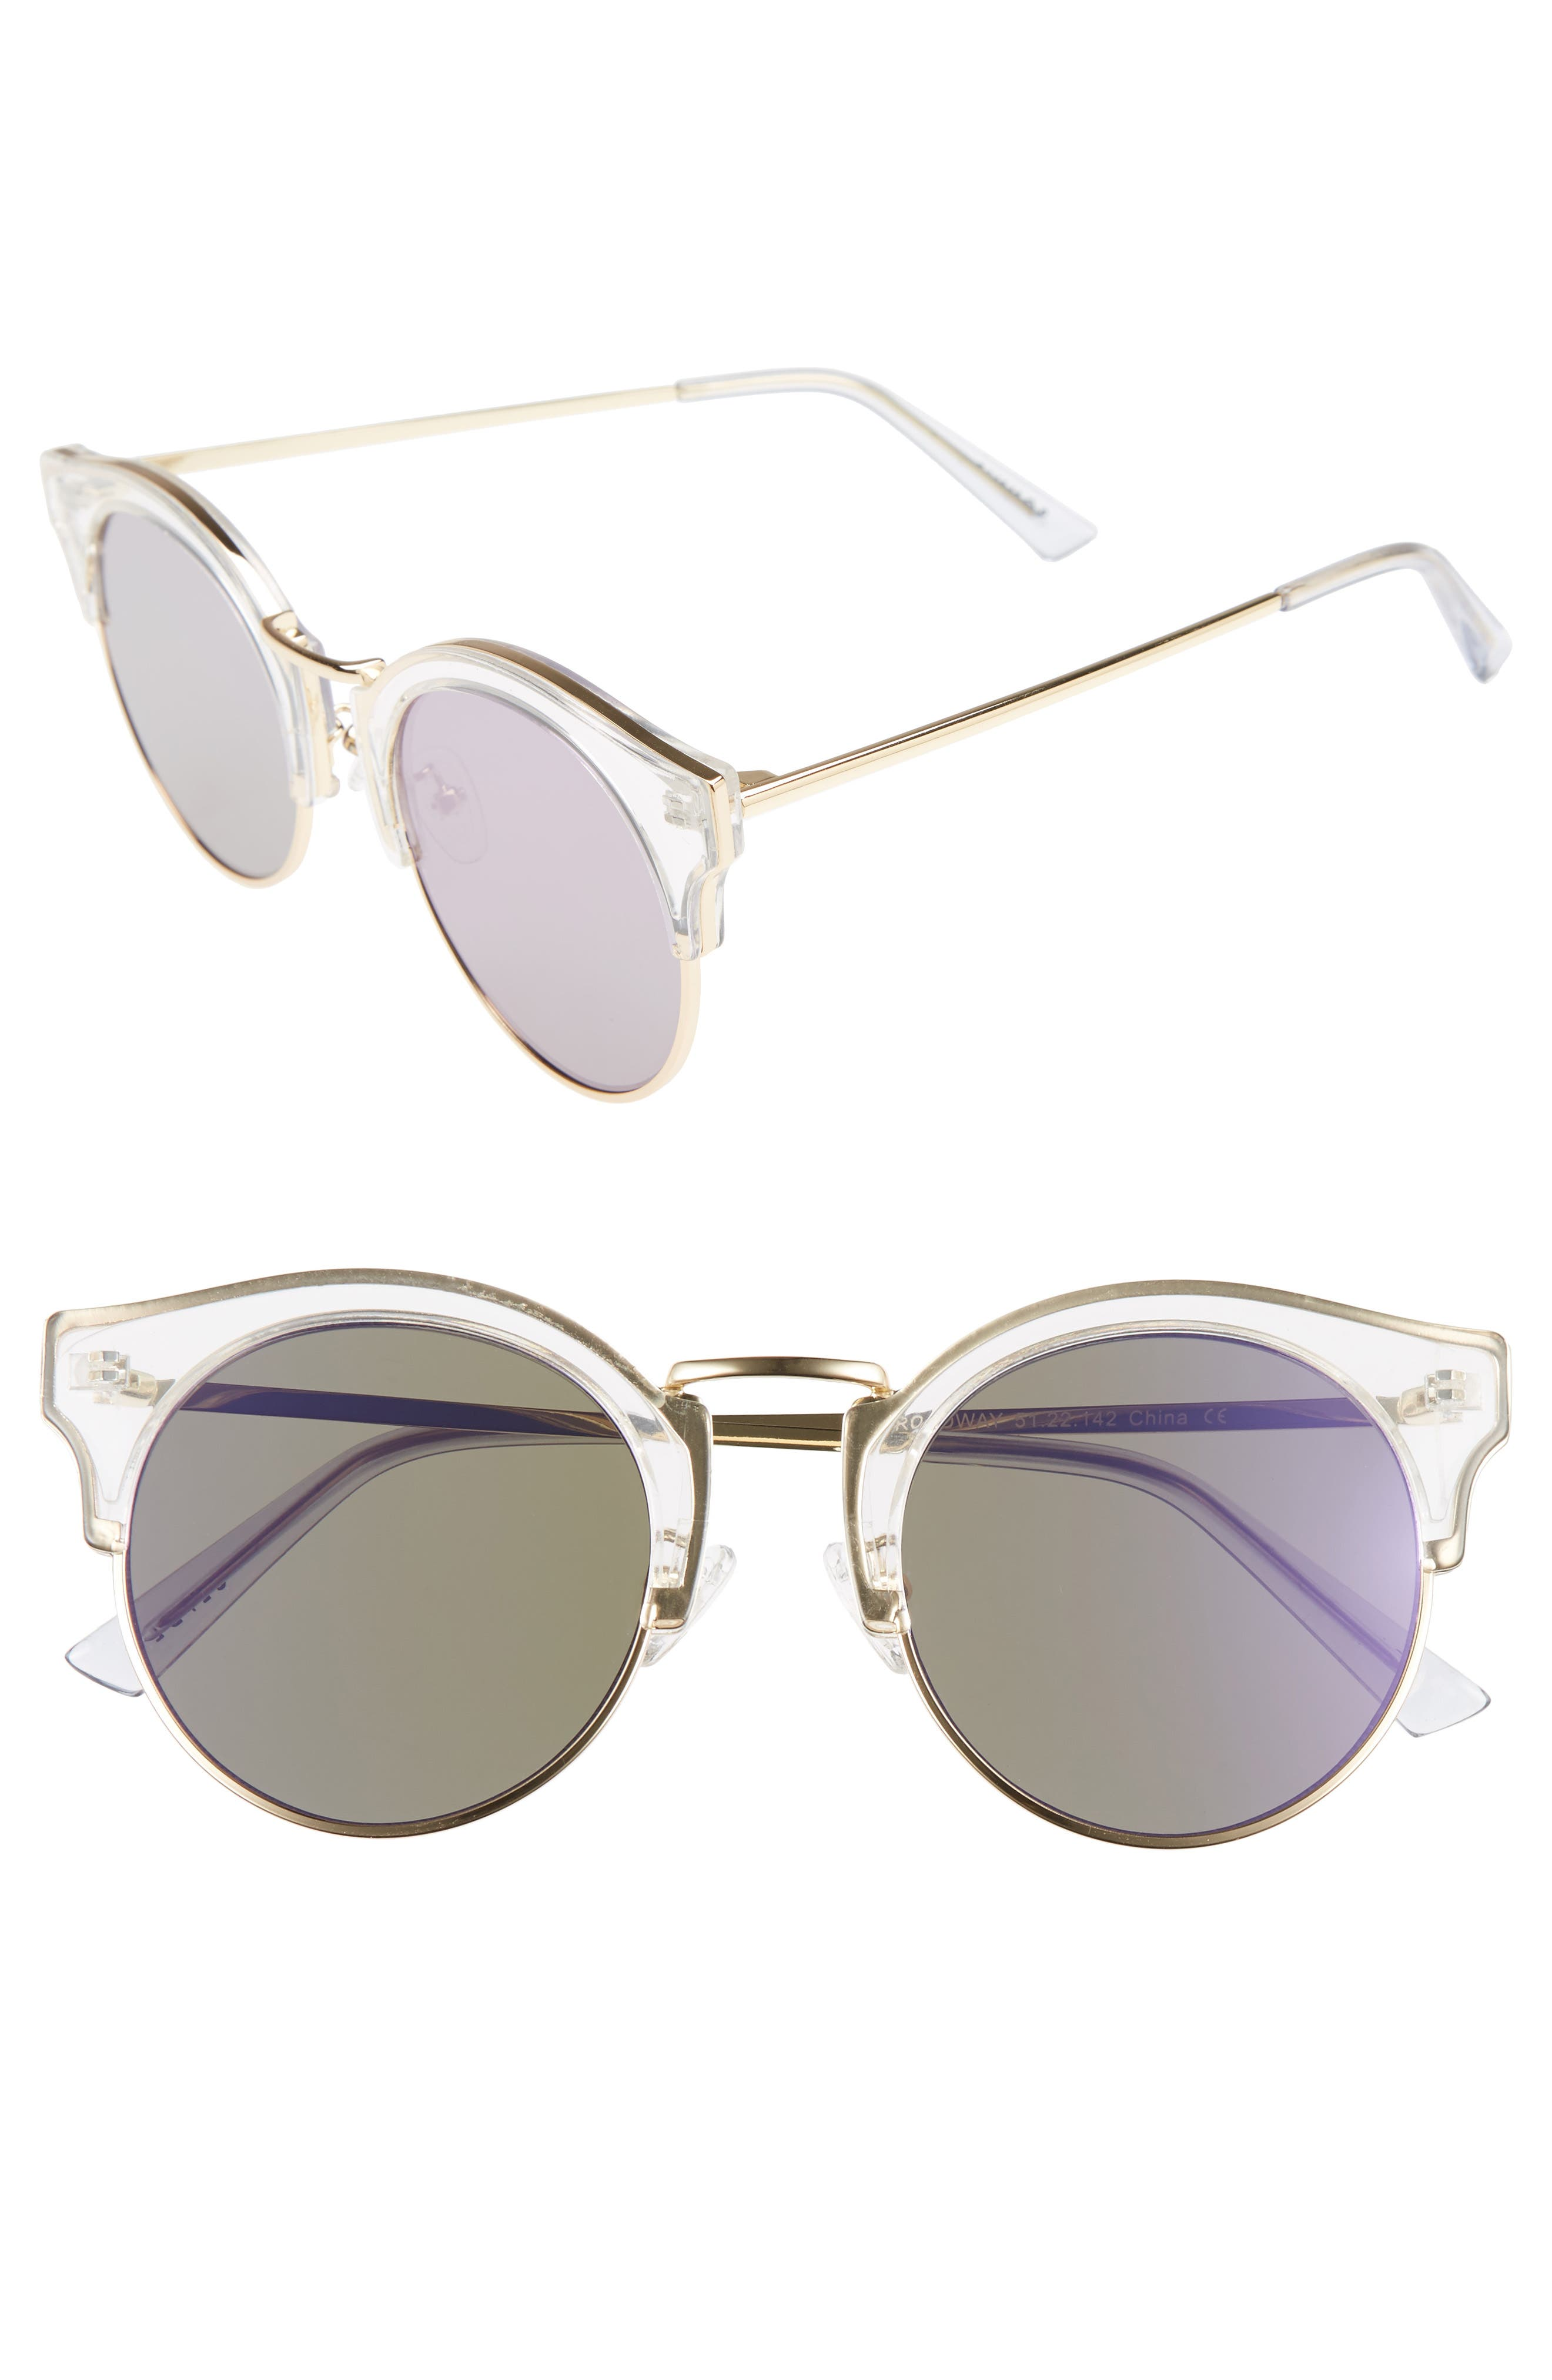 Bonnie Clyde Broadway 51mm Retro Sunglasses